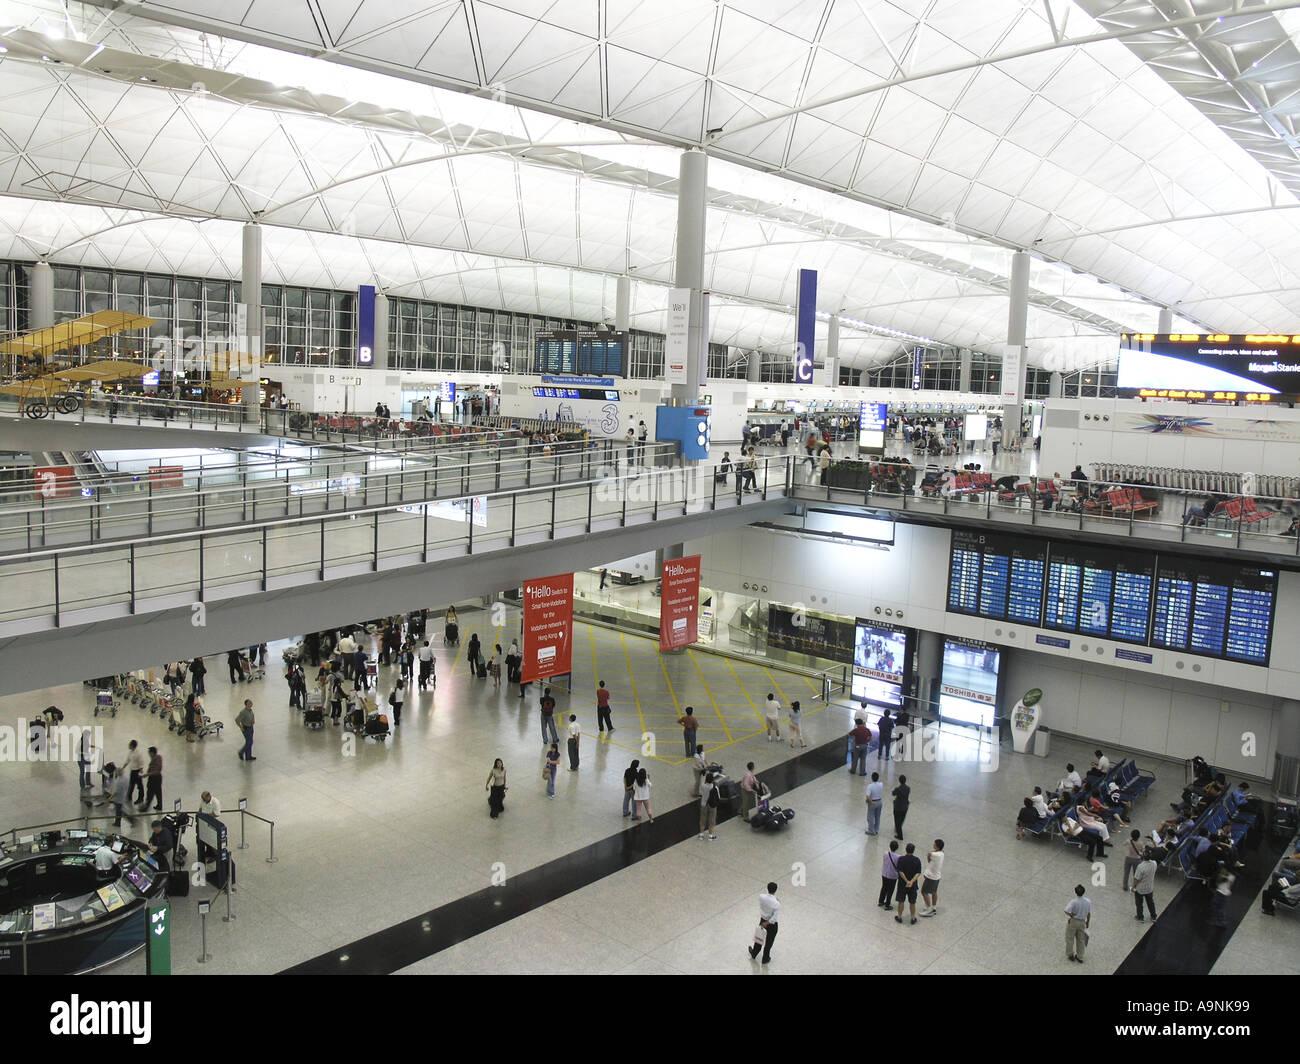 Hong Kong International Airport Chek Lap Kok hongkong HKG china - Stock Image